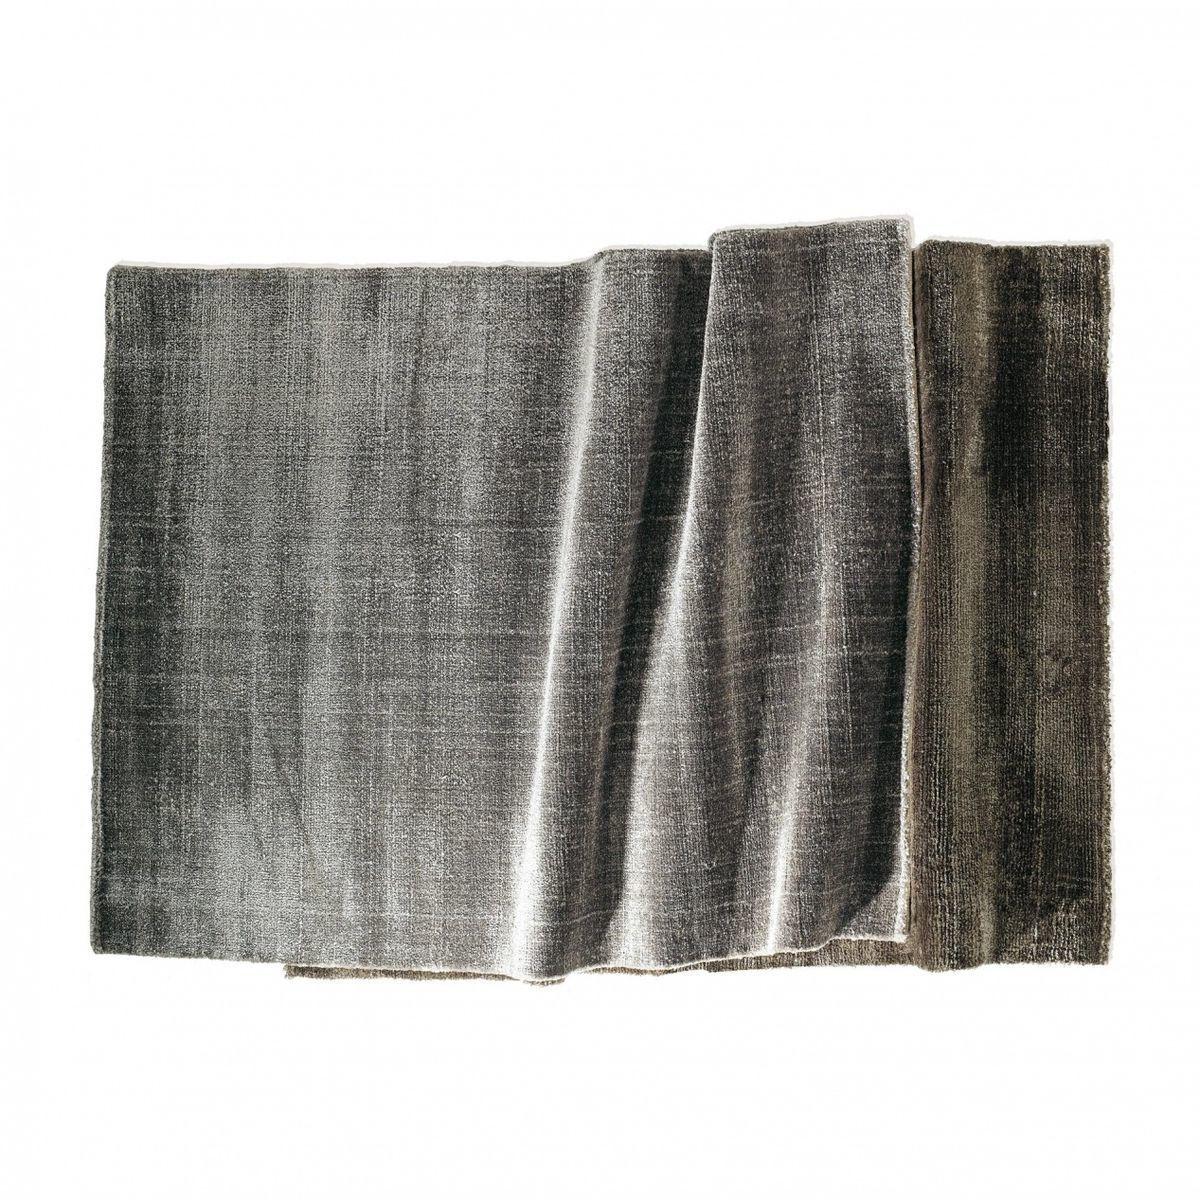 Kama teppich 200x300 g t design for Vitra design teppich